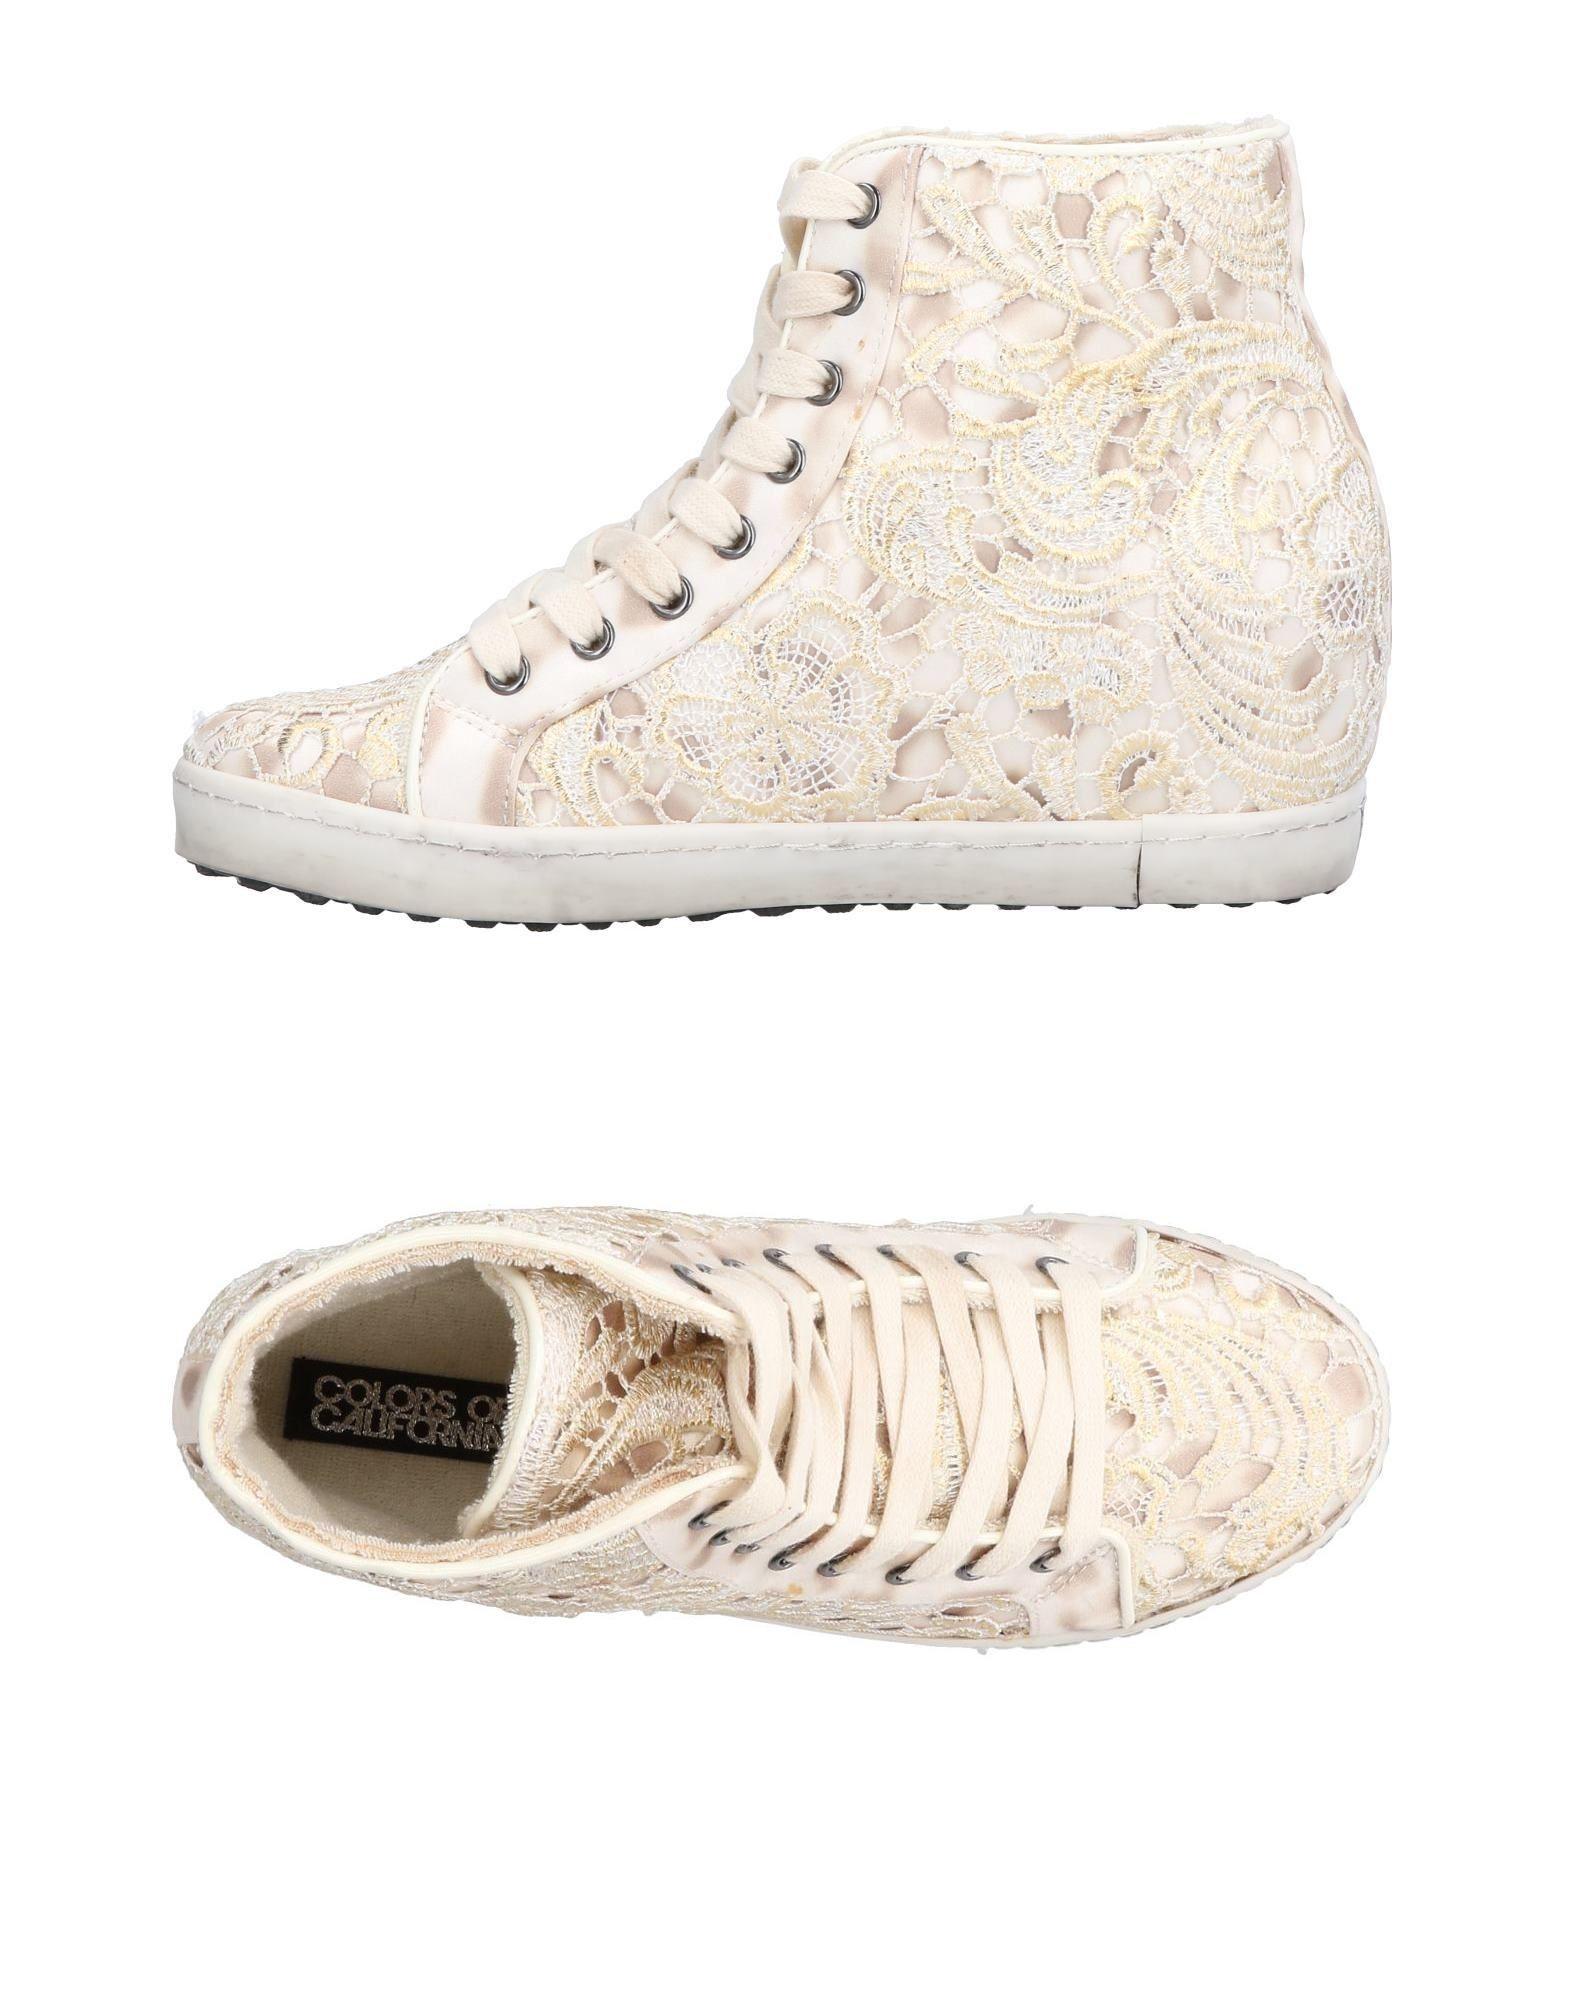 64f91cebb2 COLORS OF CALIFORNIA ΠΑΠΟΥΤΣΙΑ Χαμηλά sneakers